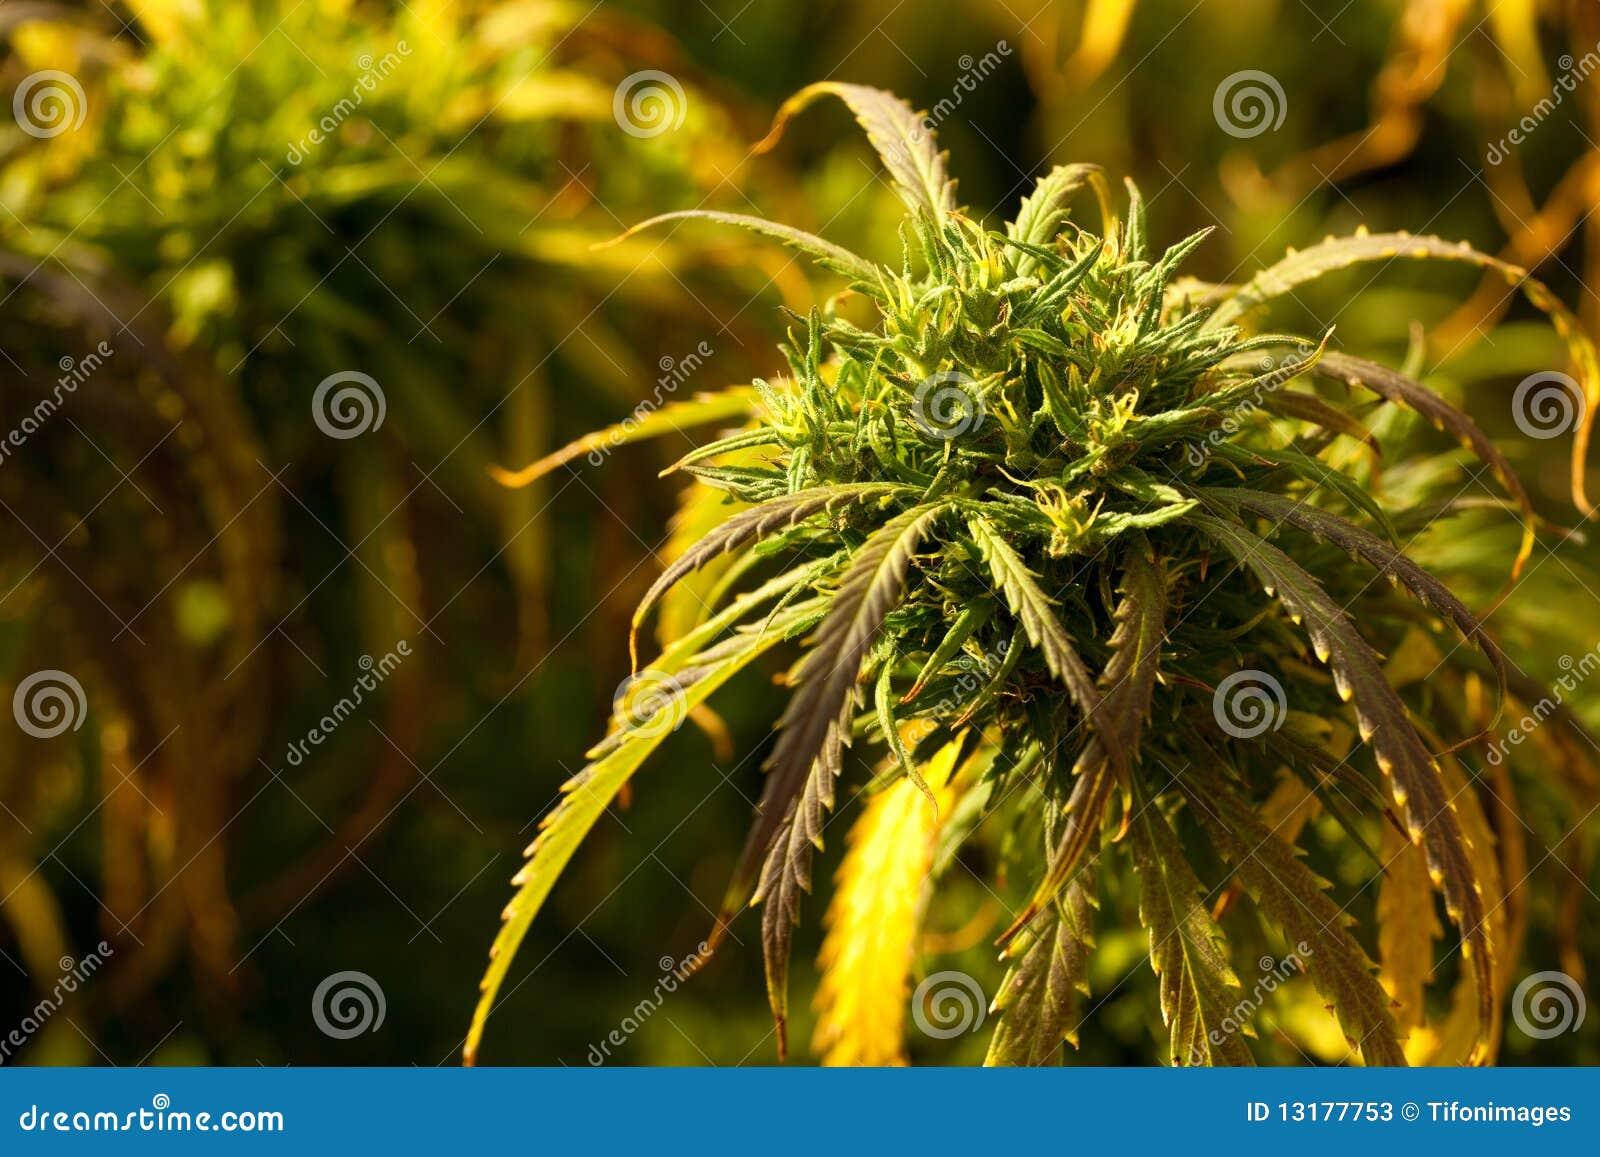 Marijuana Plant Stock s Image